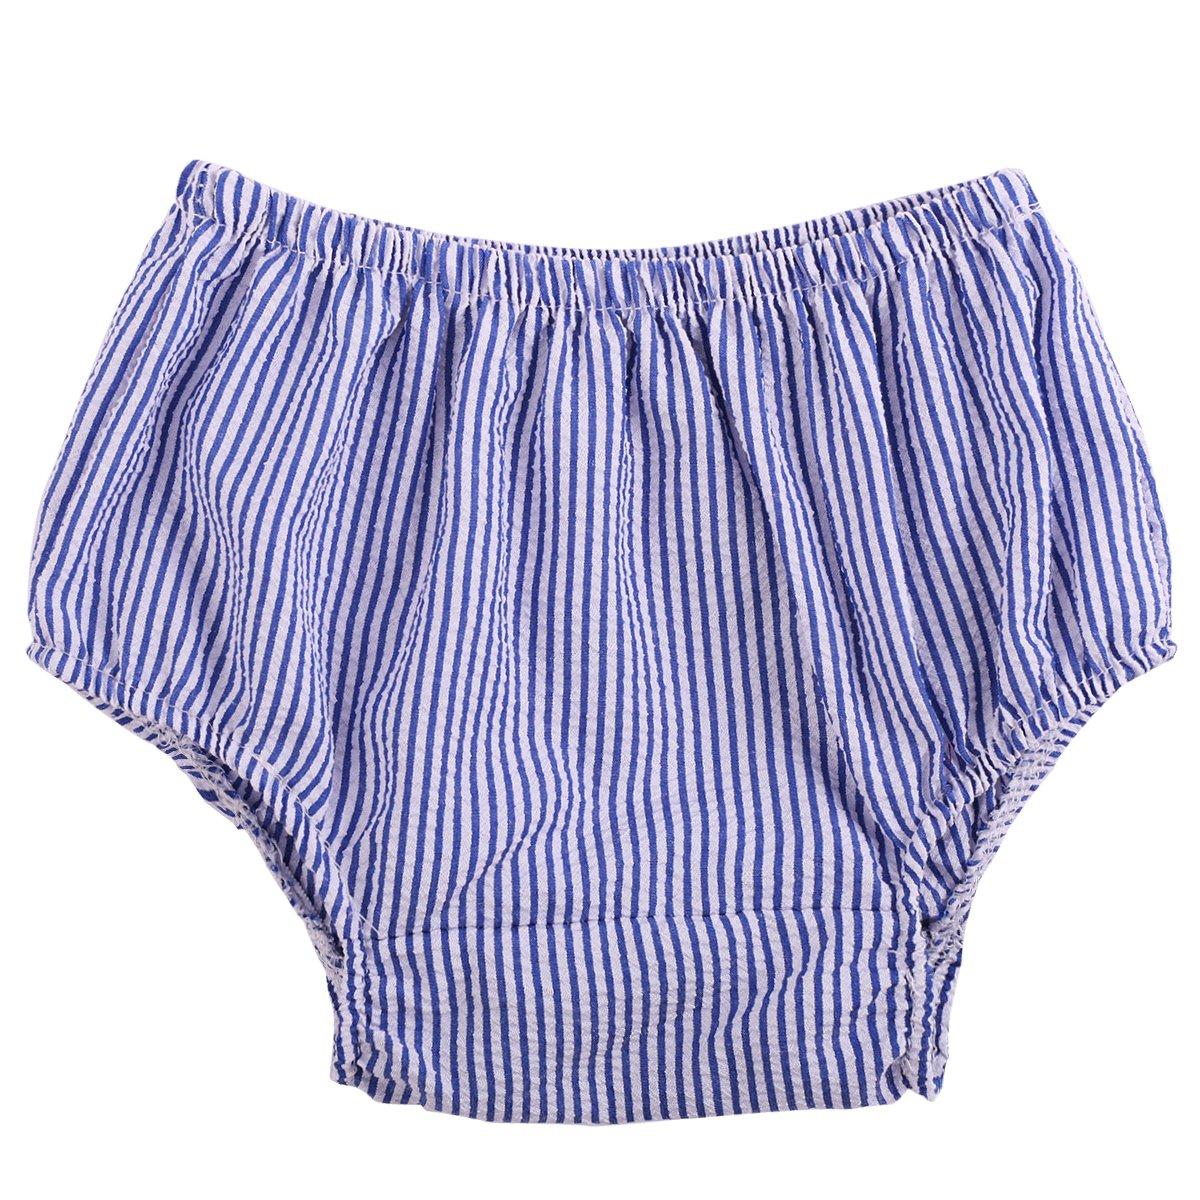 IWEMEK Baby Girl Boy Toddler Cotton Basic Diaper Cover Bloomers Shorts Briefs Panty Underwear Panties